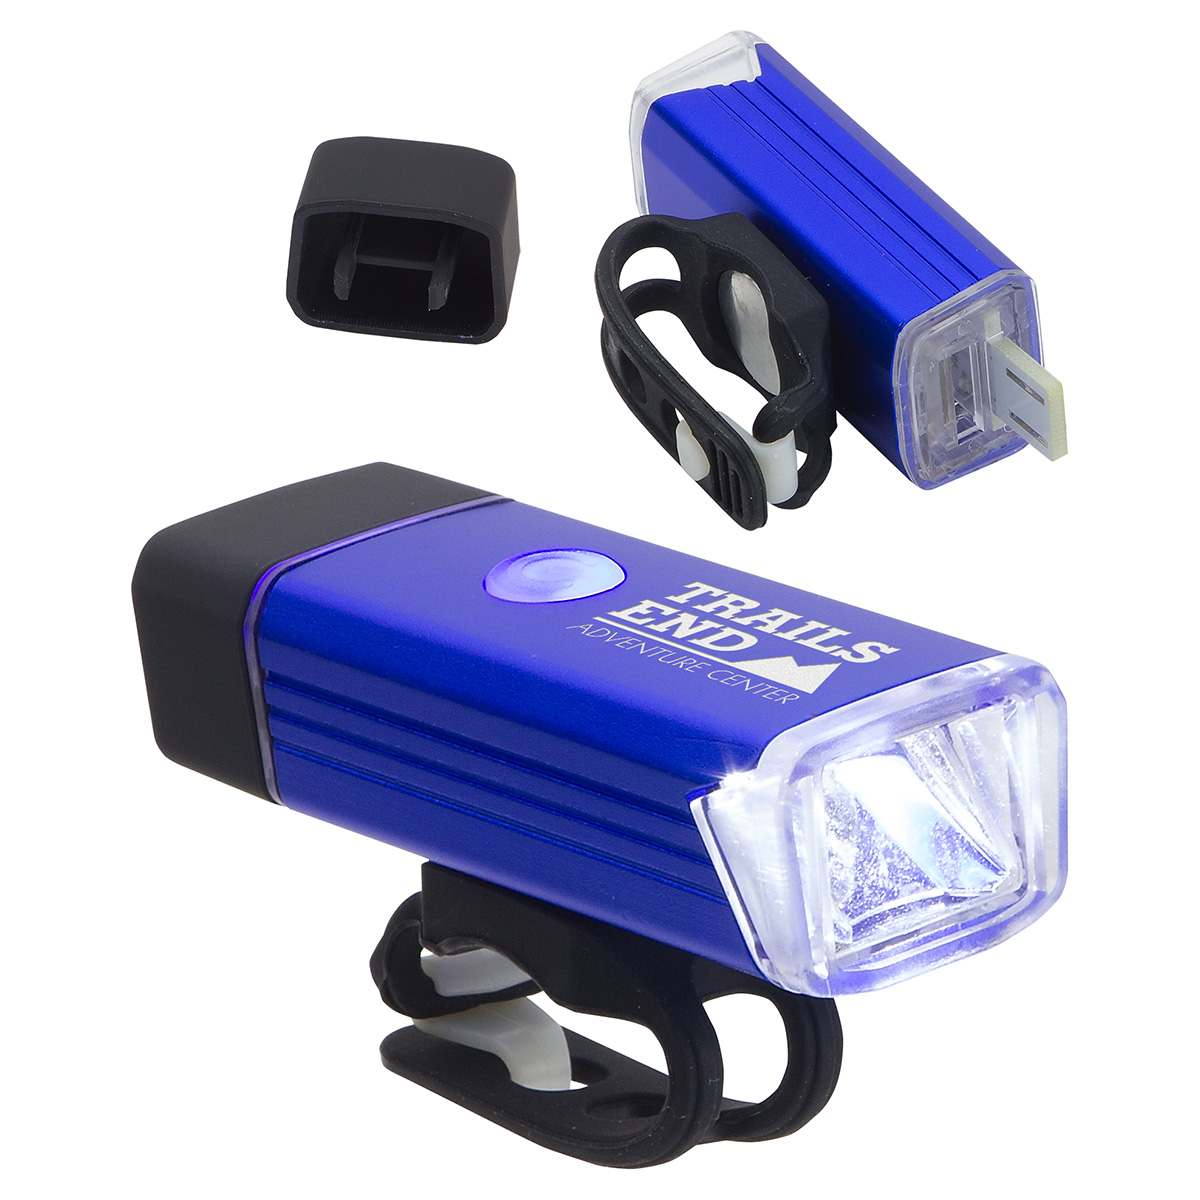 Radiant Rechargeable Bike Light, WLT-RR18, 1 Colour Imprint